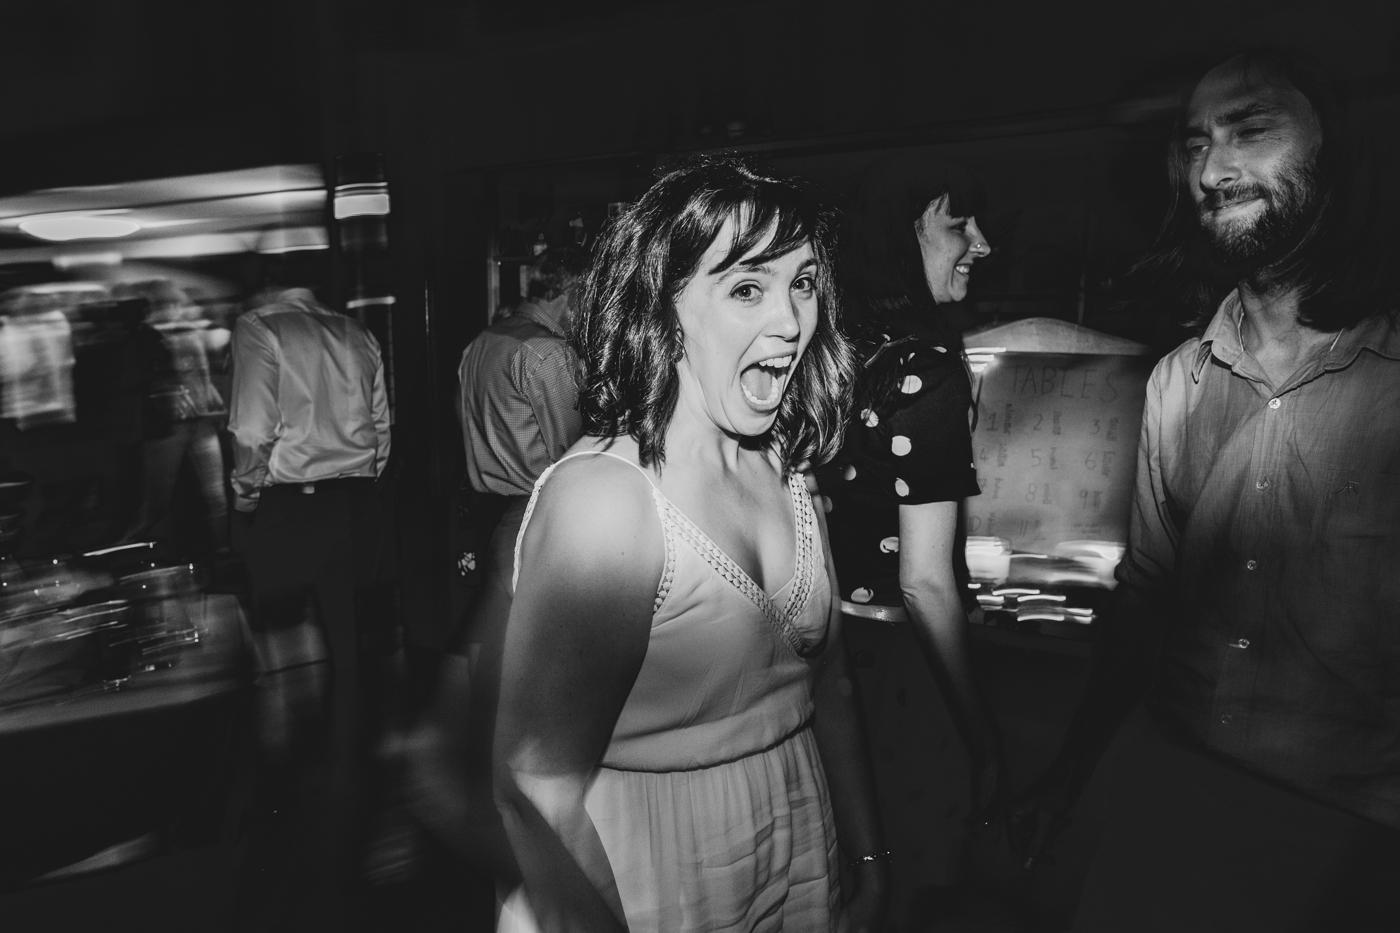 Ariana & Tim - Dunedin, New Zealand Wedding - Destination Wedding - Samantha Heather Photography-292.jpg